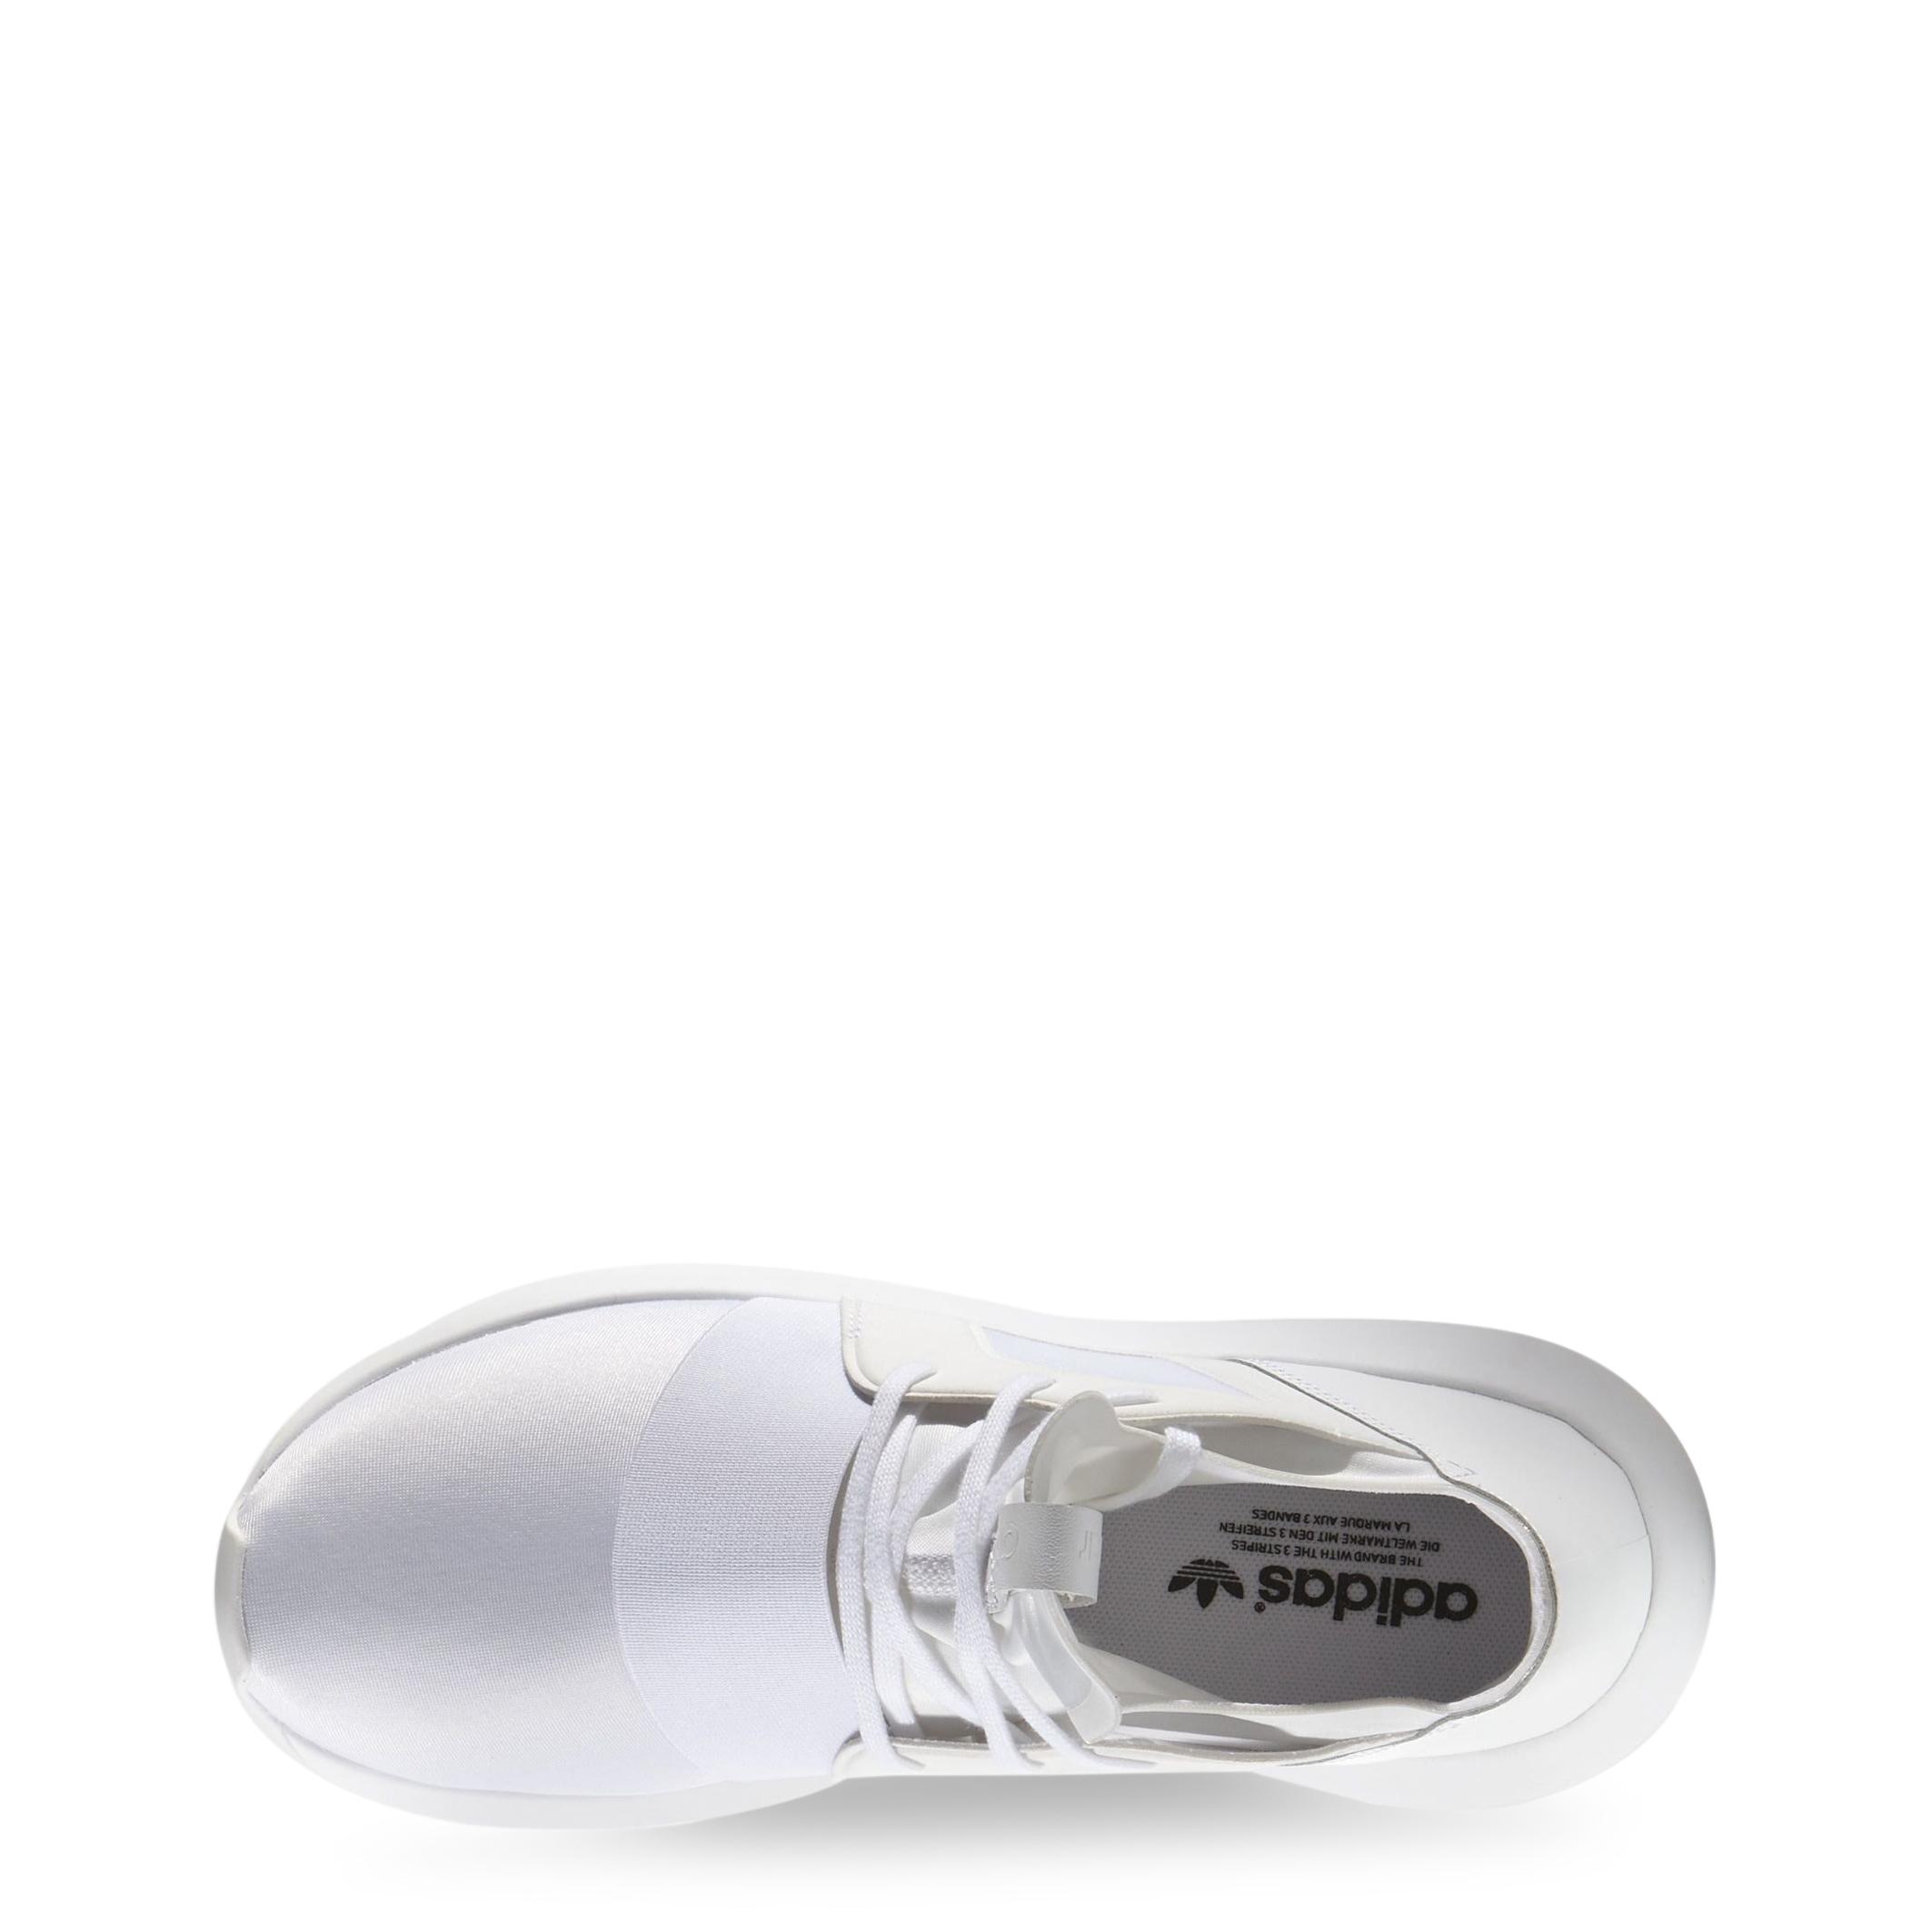 Chaussures  Adidas TUBULAR_DEFIANT white